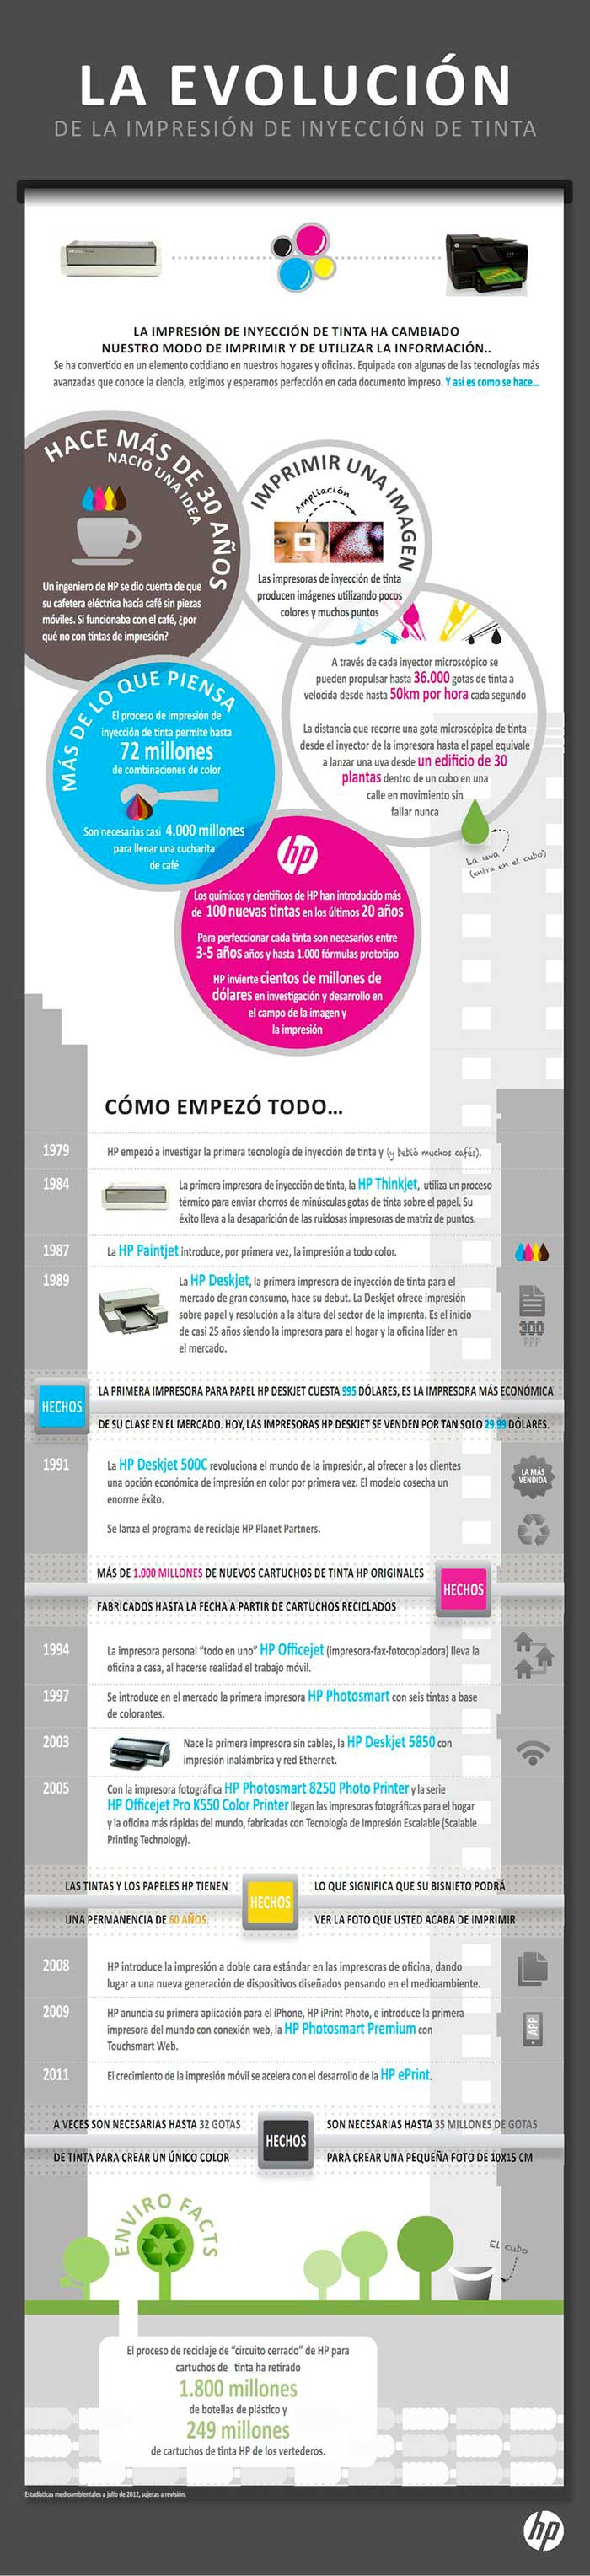 Infografia sobre la evolucion de la impresion de inyeccion de tinta